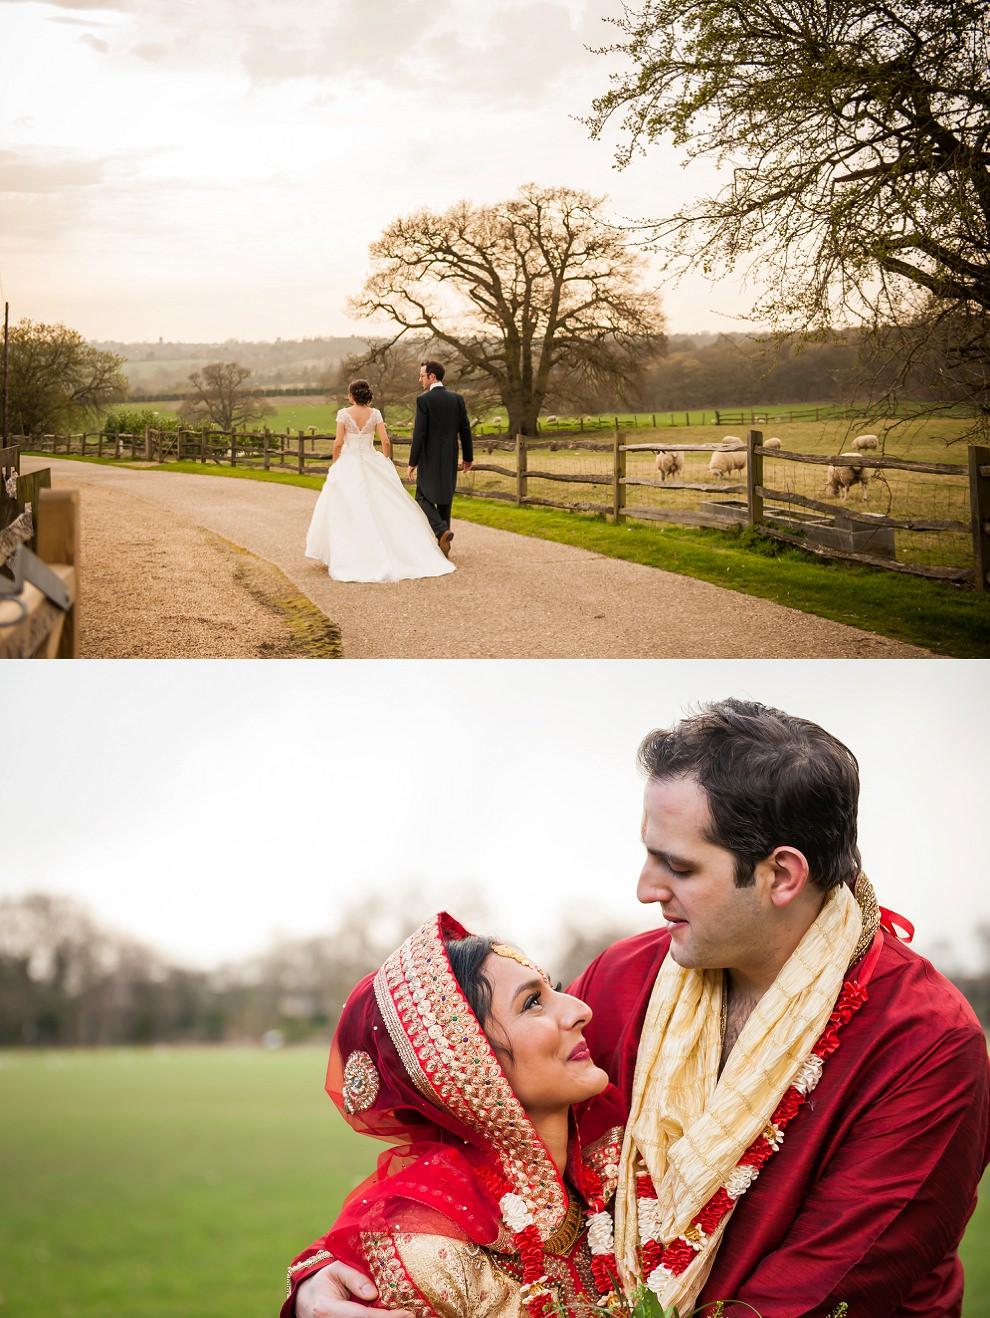 Best-wedding-photos-UK-2015-128